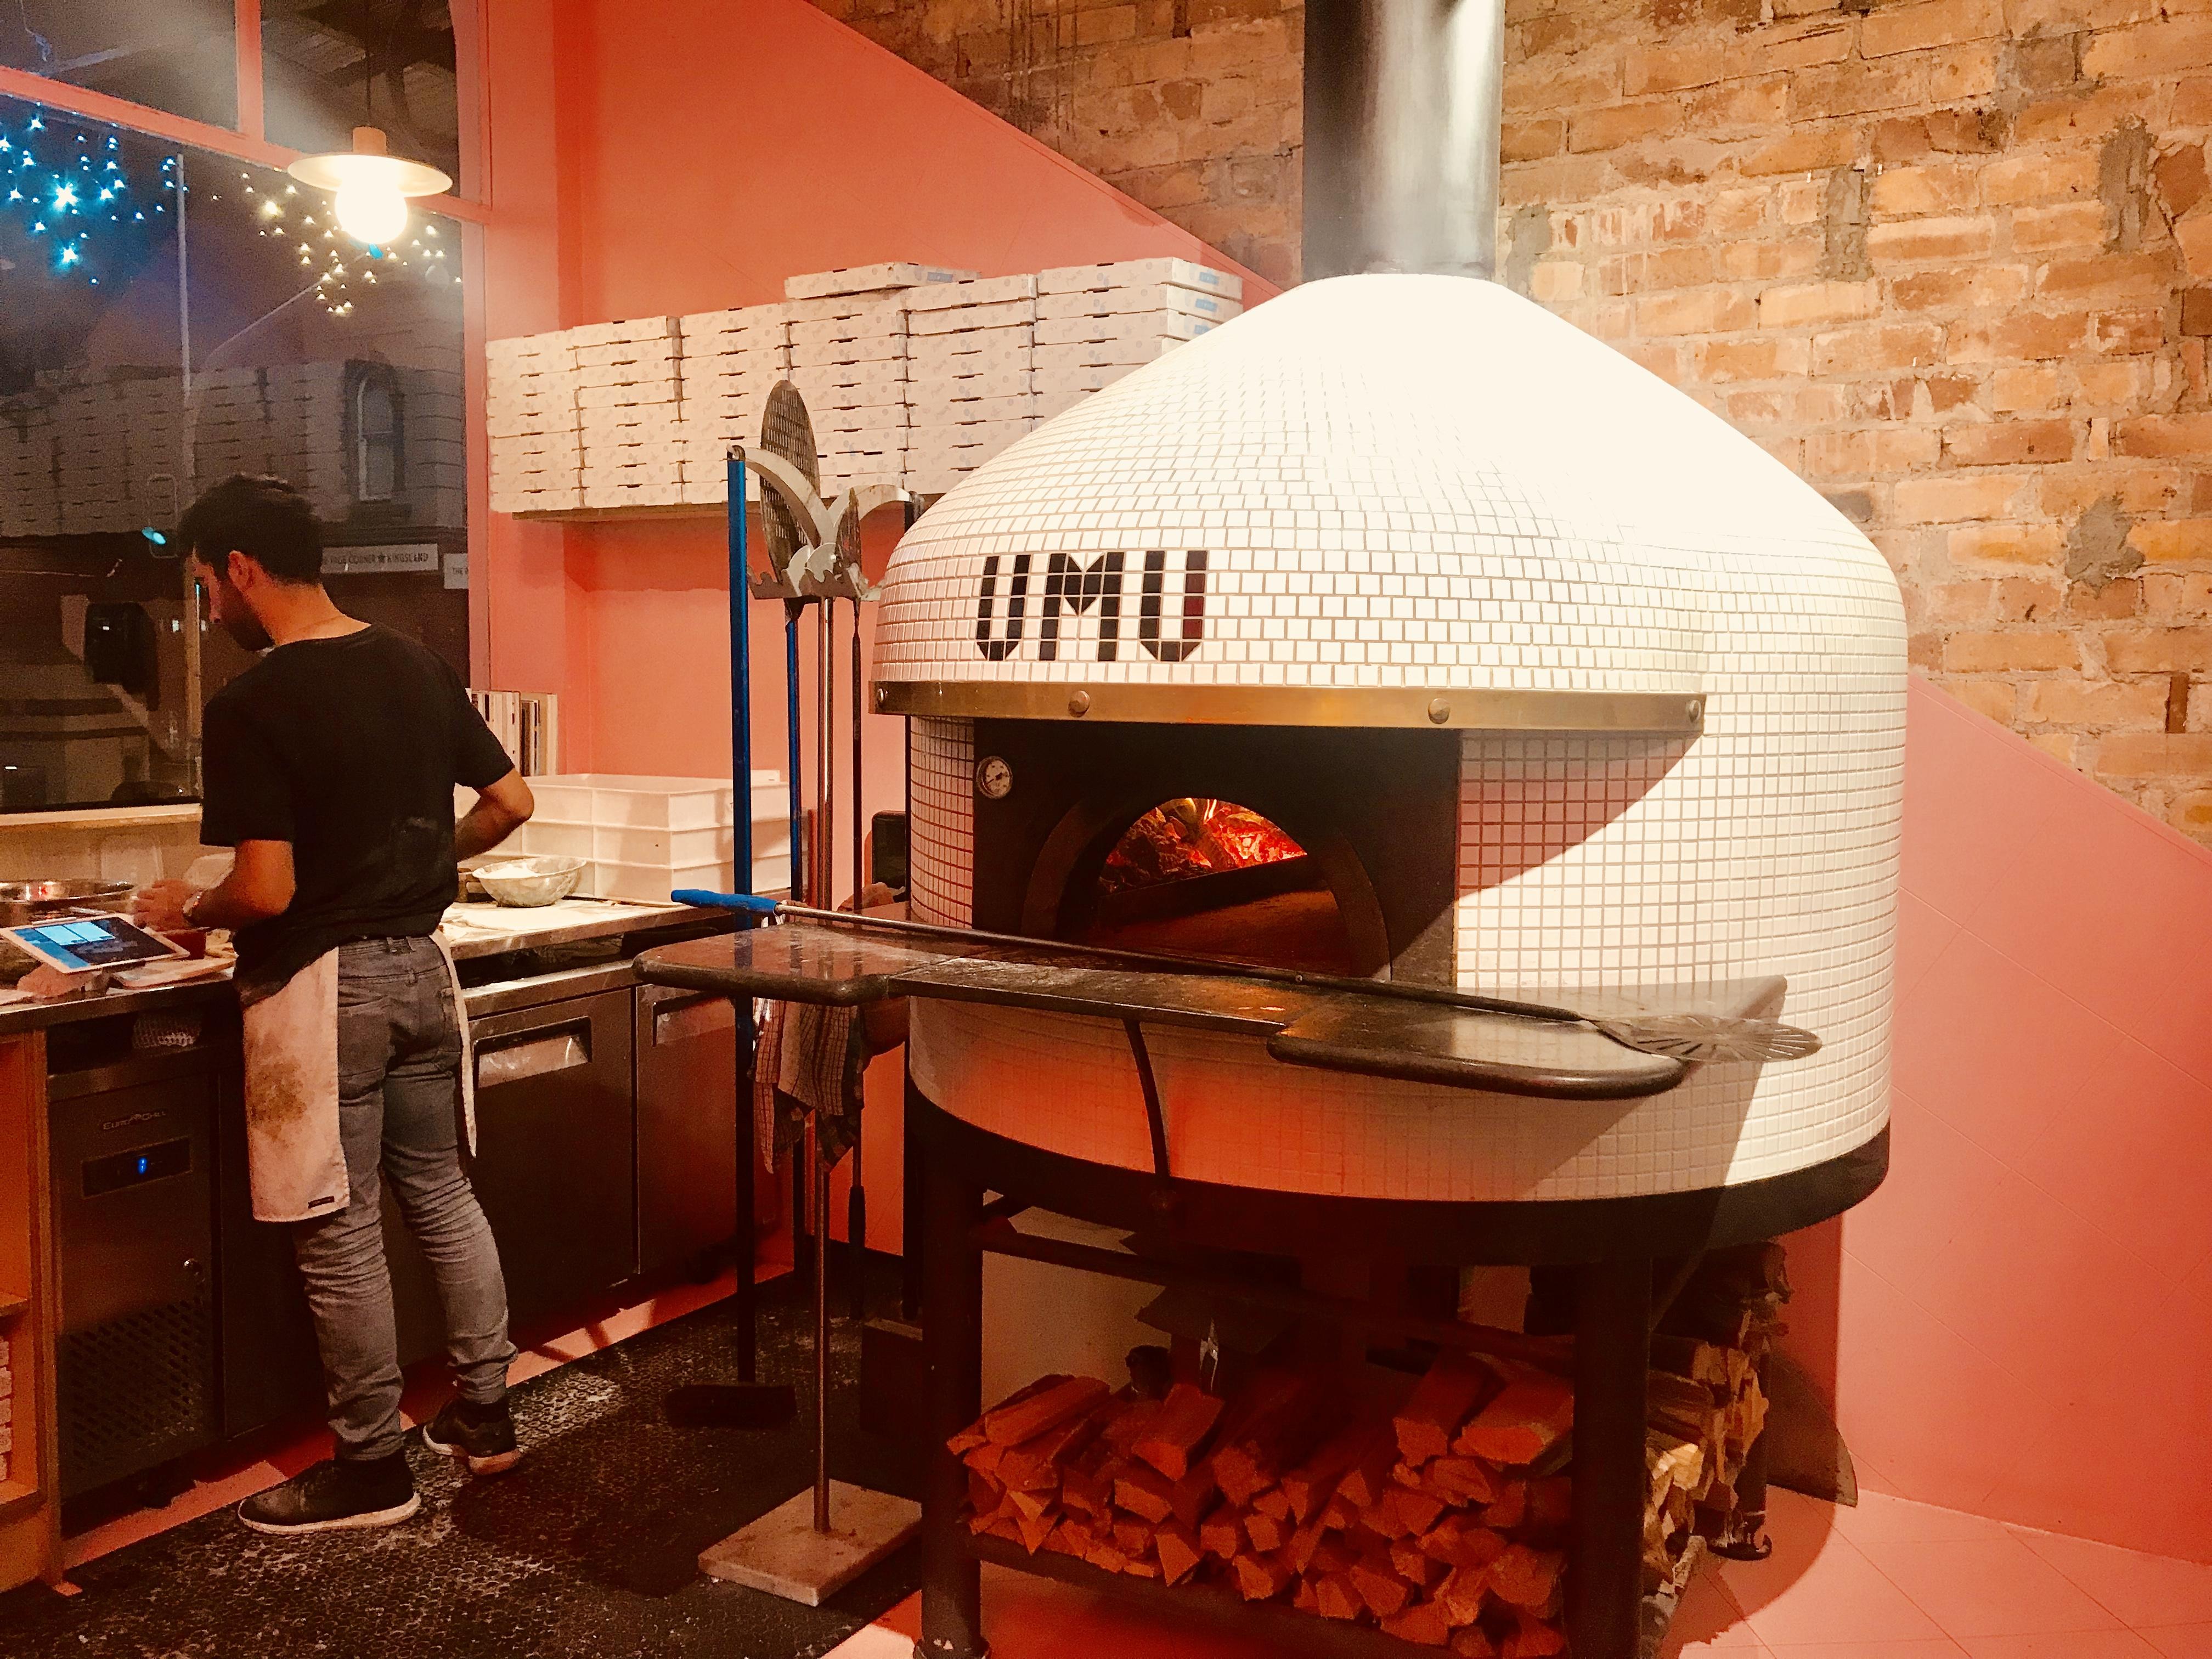 Umu Pizza, Kingsland, Auckland